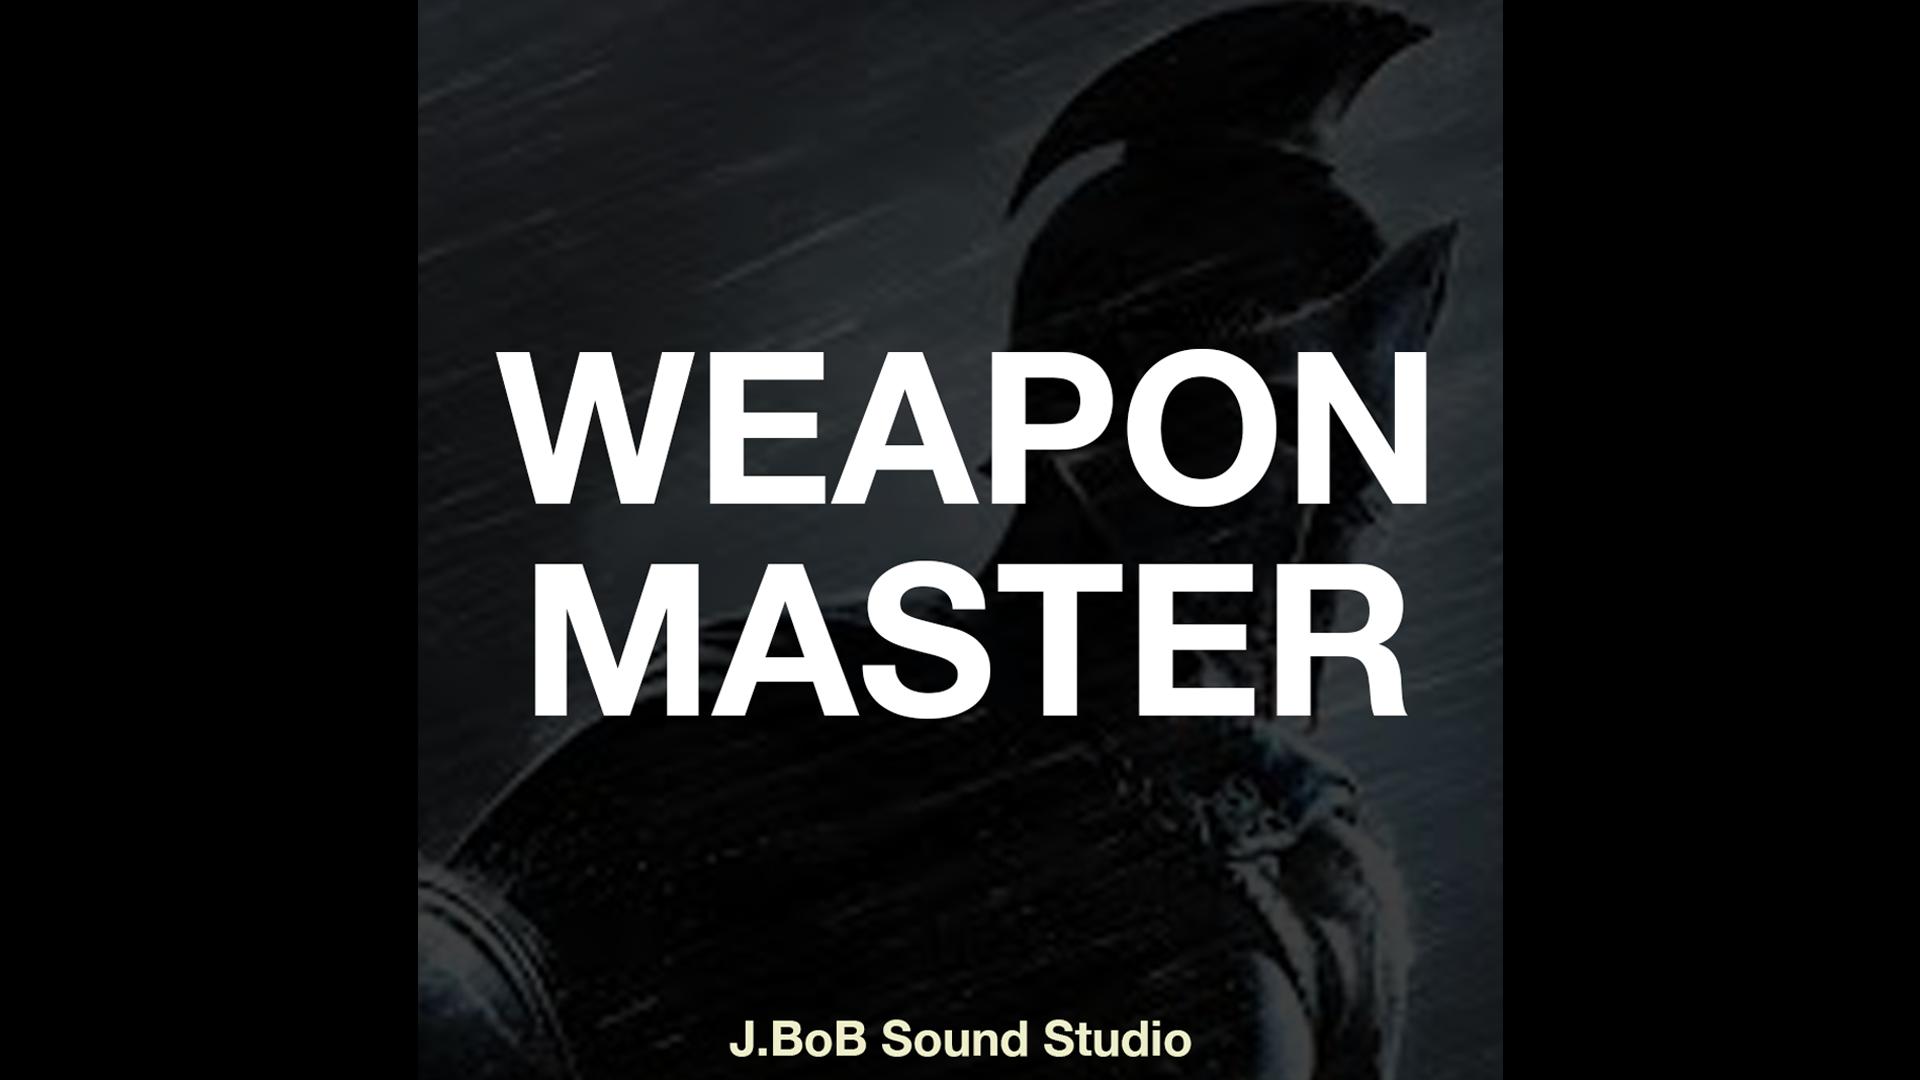 Weapon Master by J BoB Sound Studio in Sound Effects - UE4